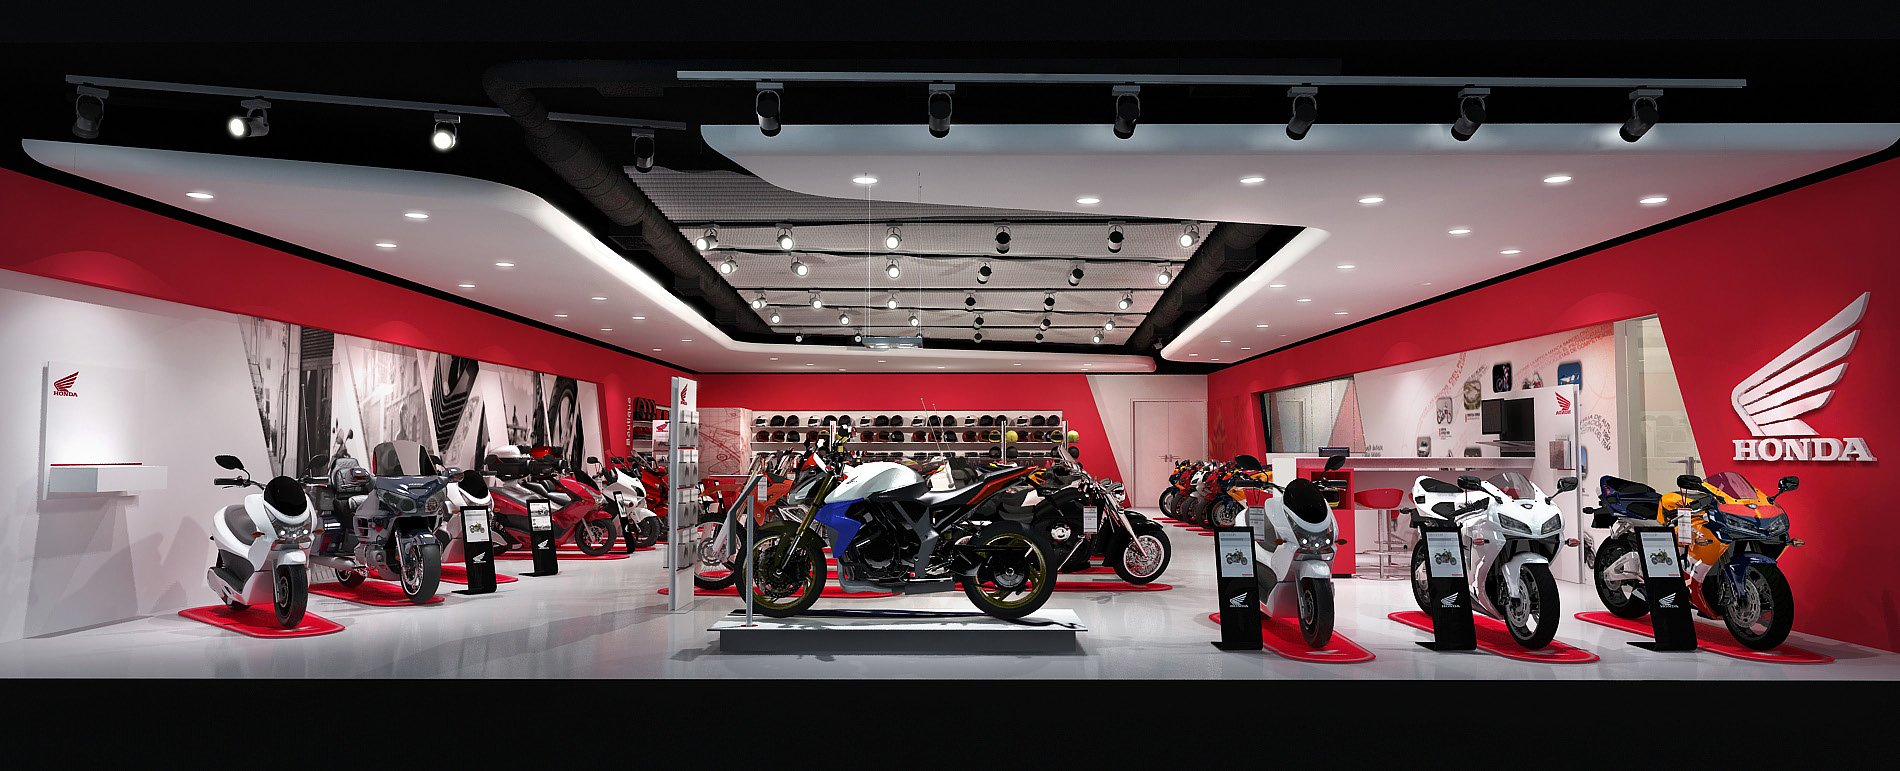 Дилеры мототехники Honda приглашают на тест-драйв новинок